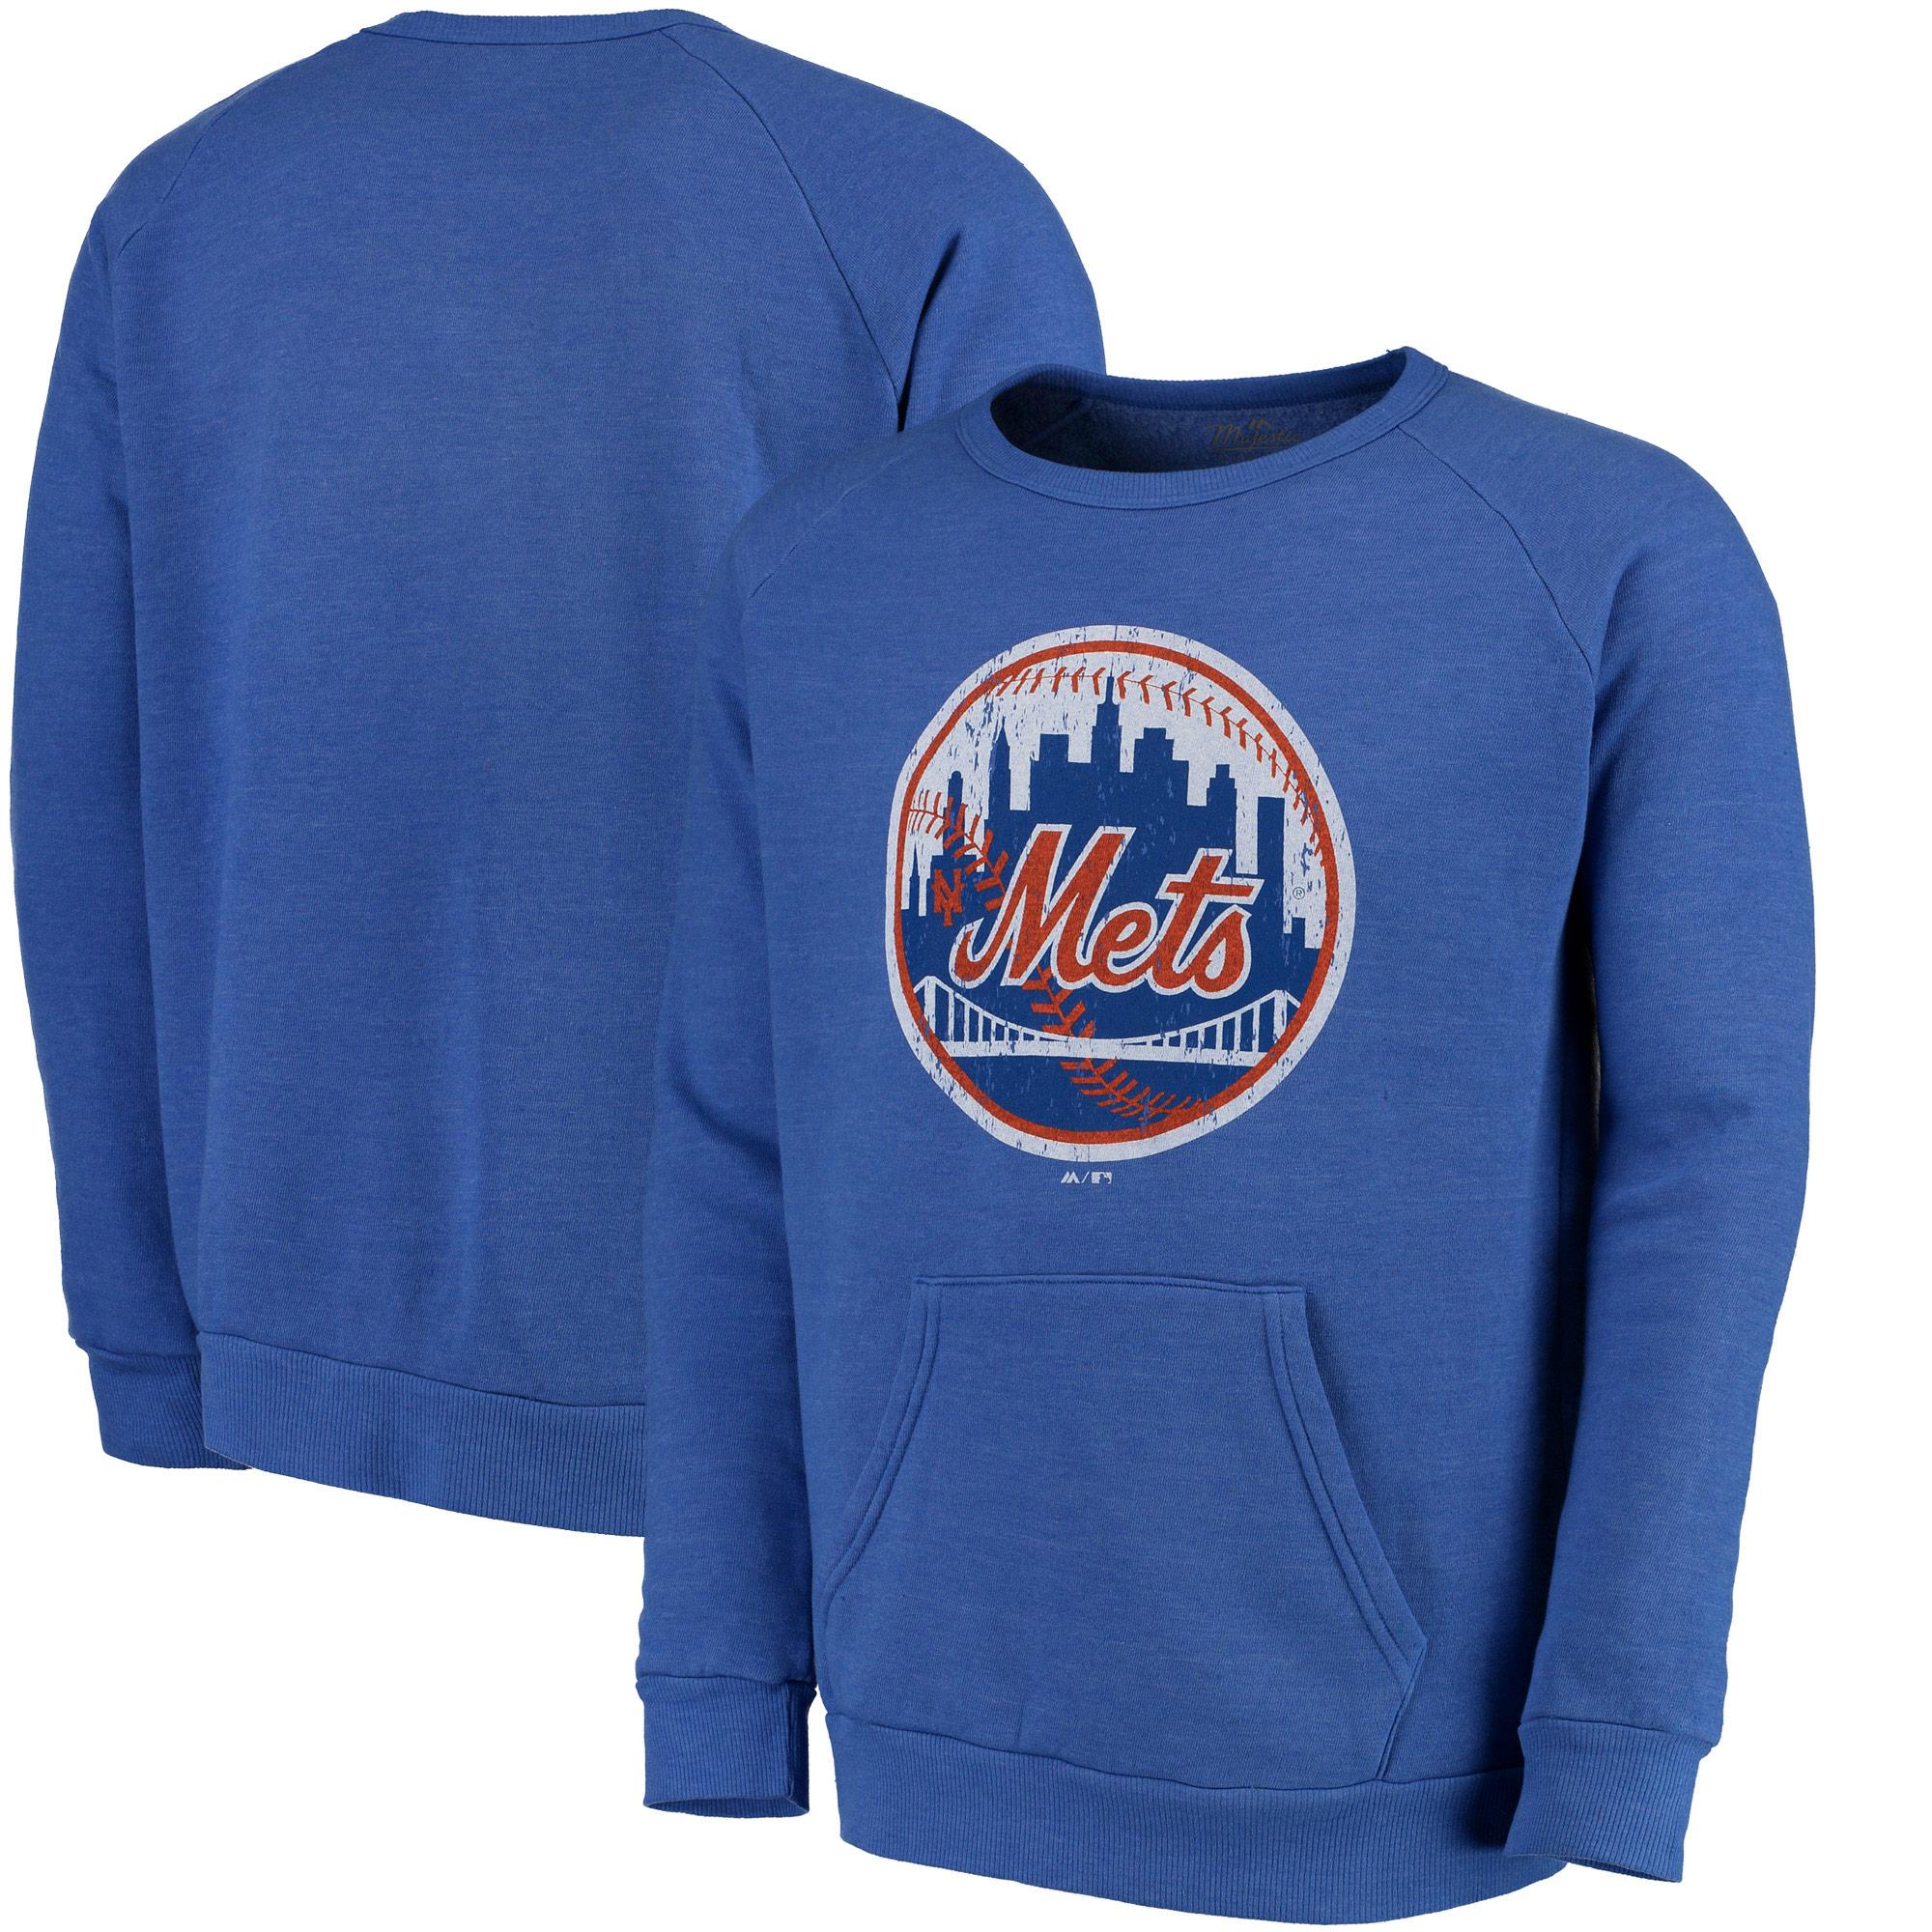 New York Mets Majestic Threads Cooperstown Collection Tri-Blend Pocket Fleece Sweatshirt - Royal